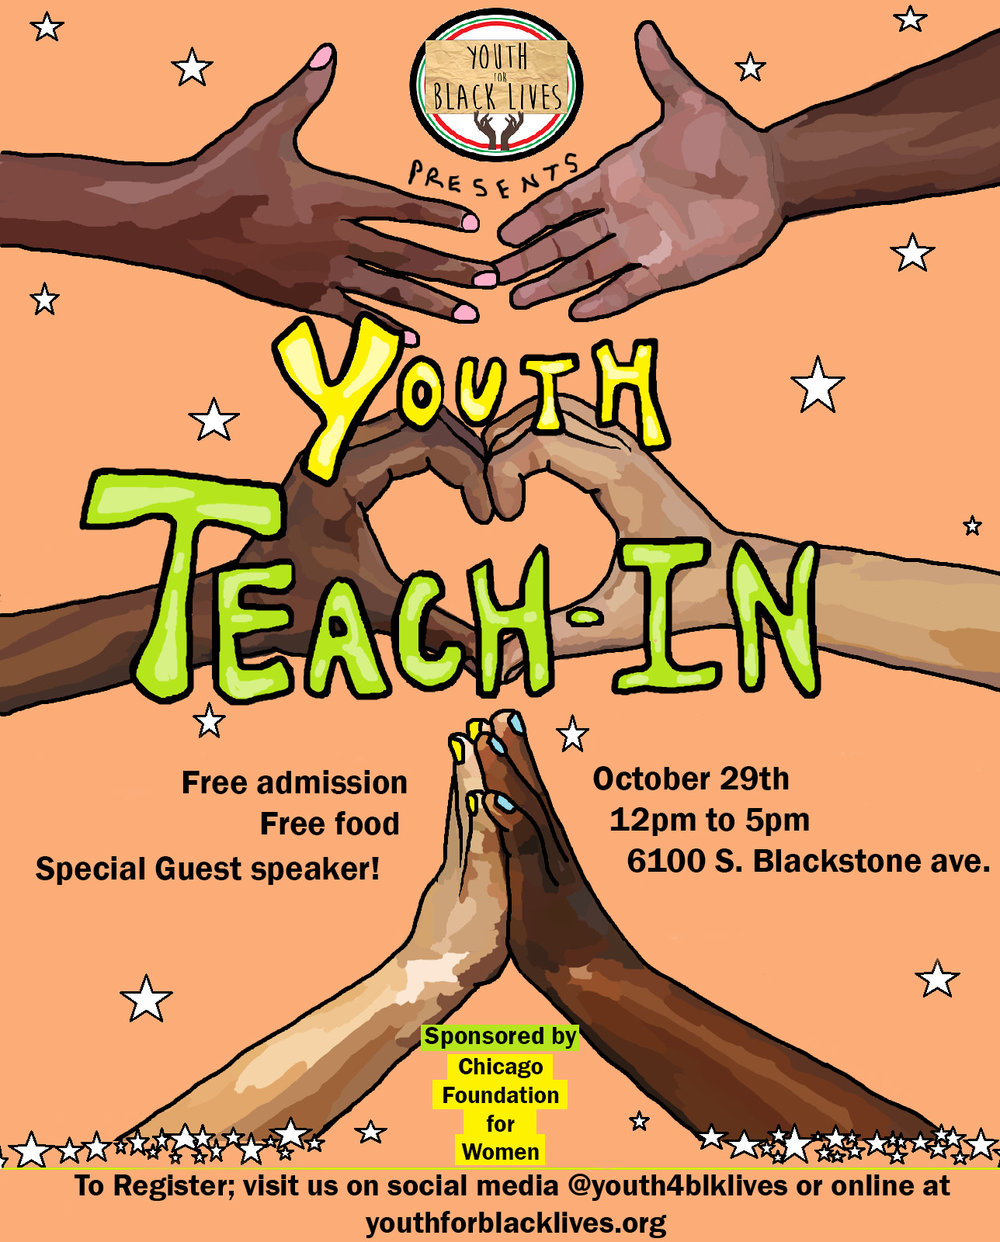 teach in flyer greenyellow.jpg